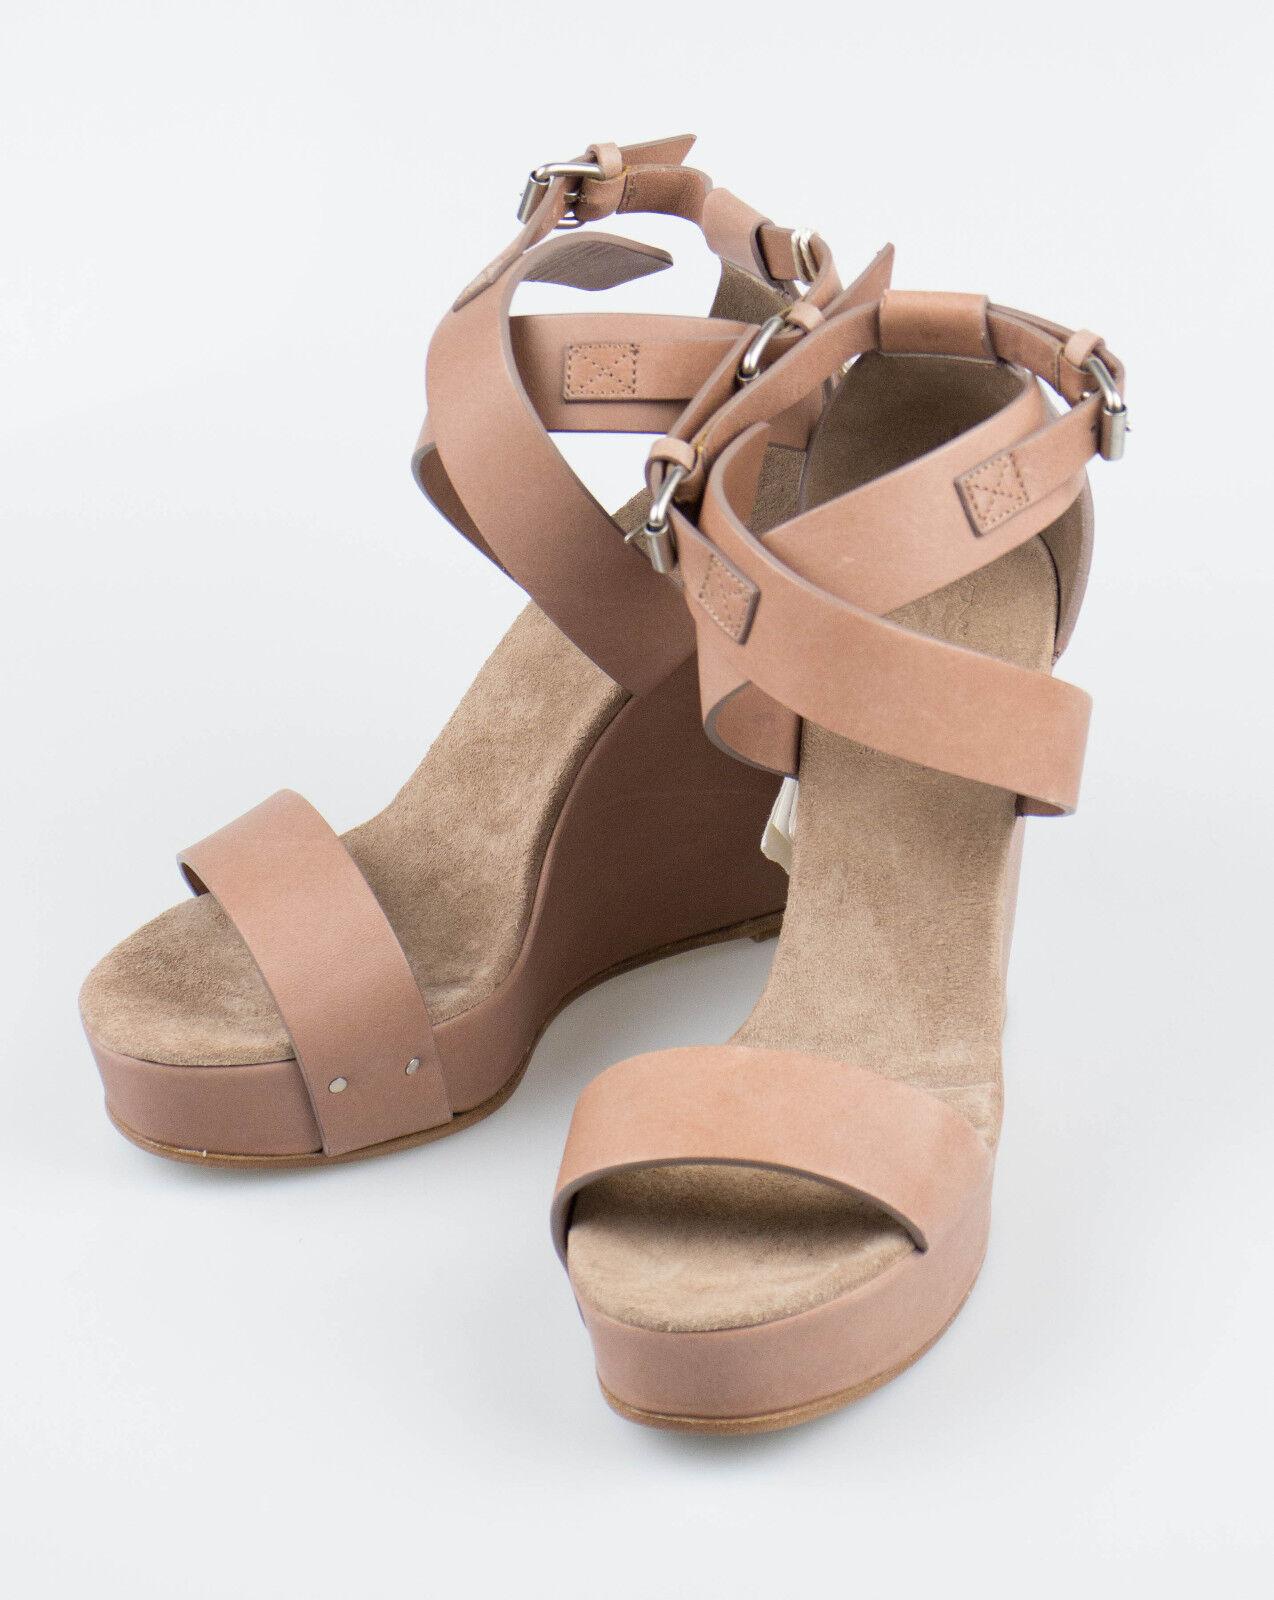 New. BRUNELLO CUCINELLI braun Leather Leather Leather Open Toe Wedge Heels schuhe 9 39  1150 4e5e33